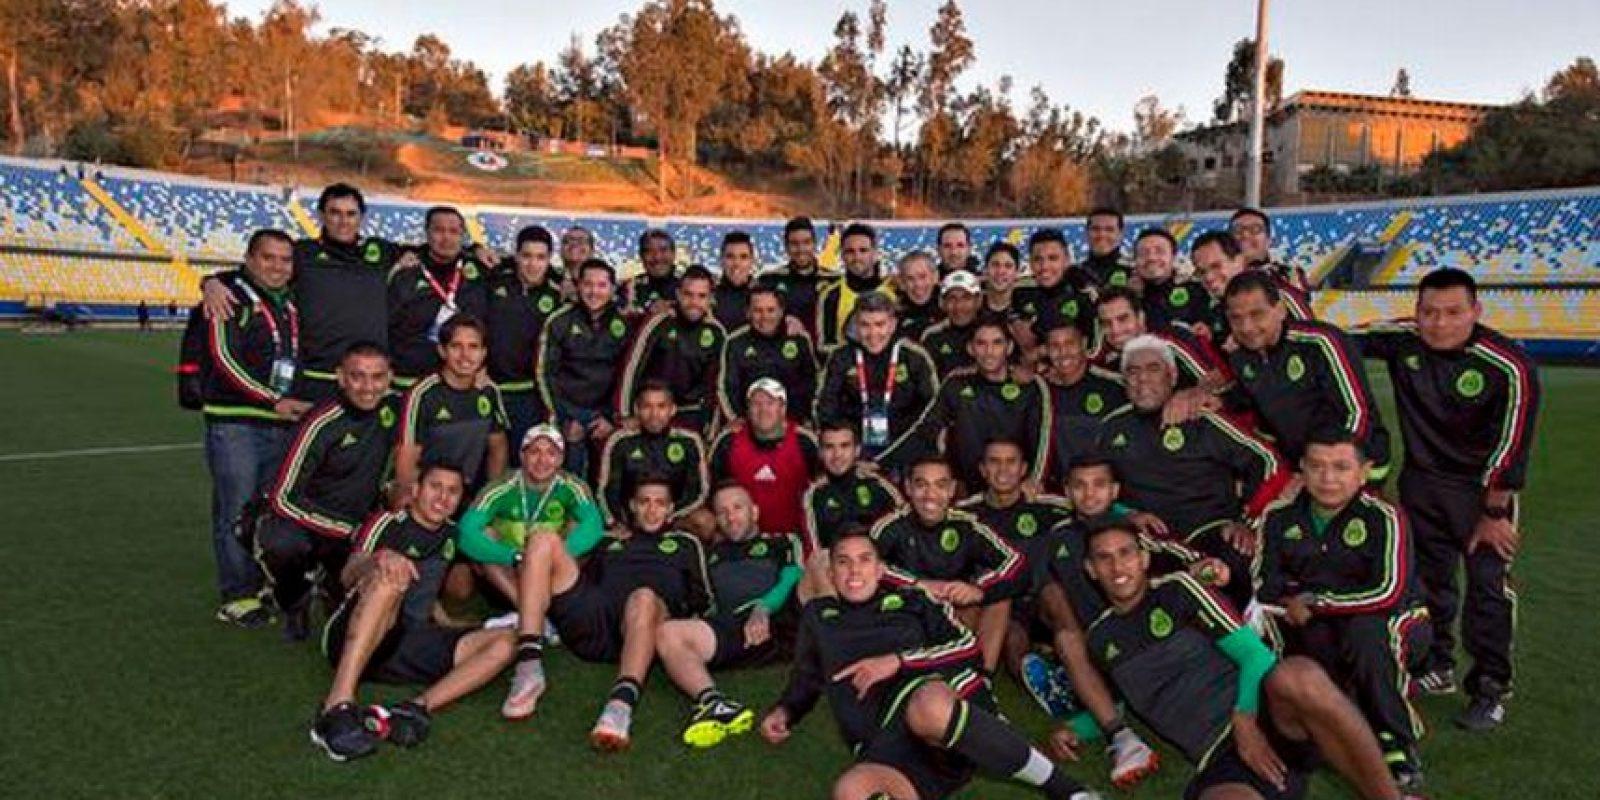 Foto:Vía twitter.com/Raul_Jimenez9